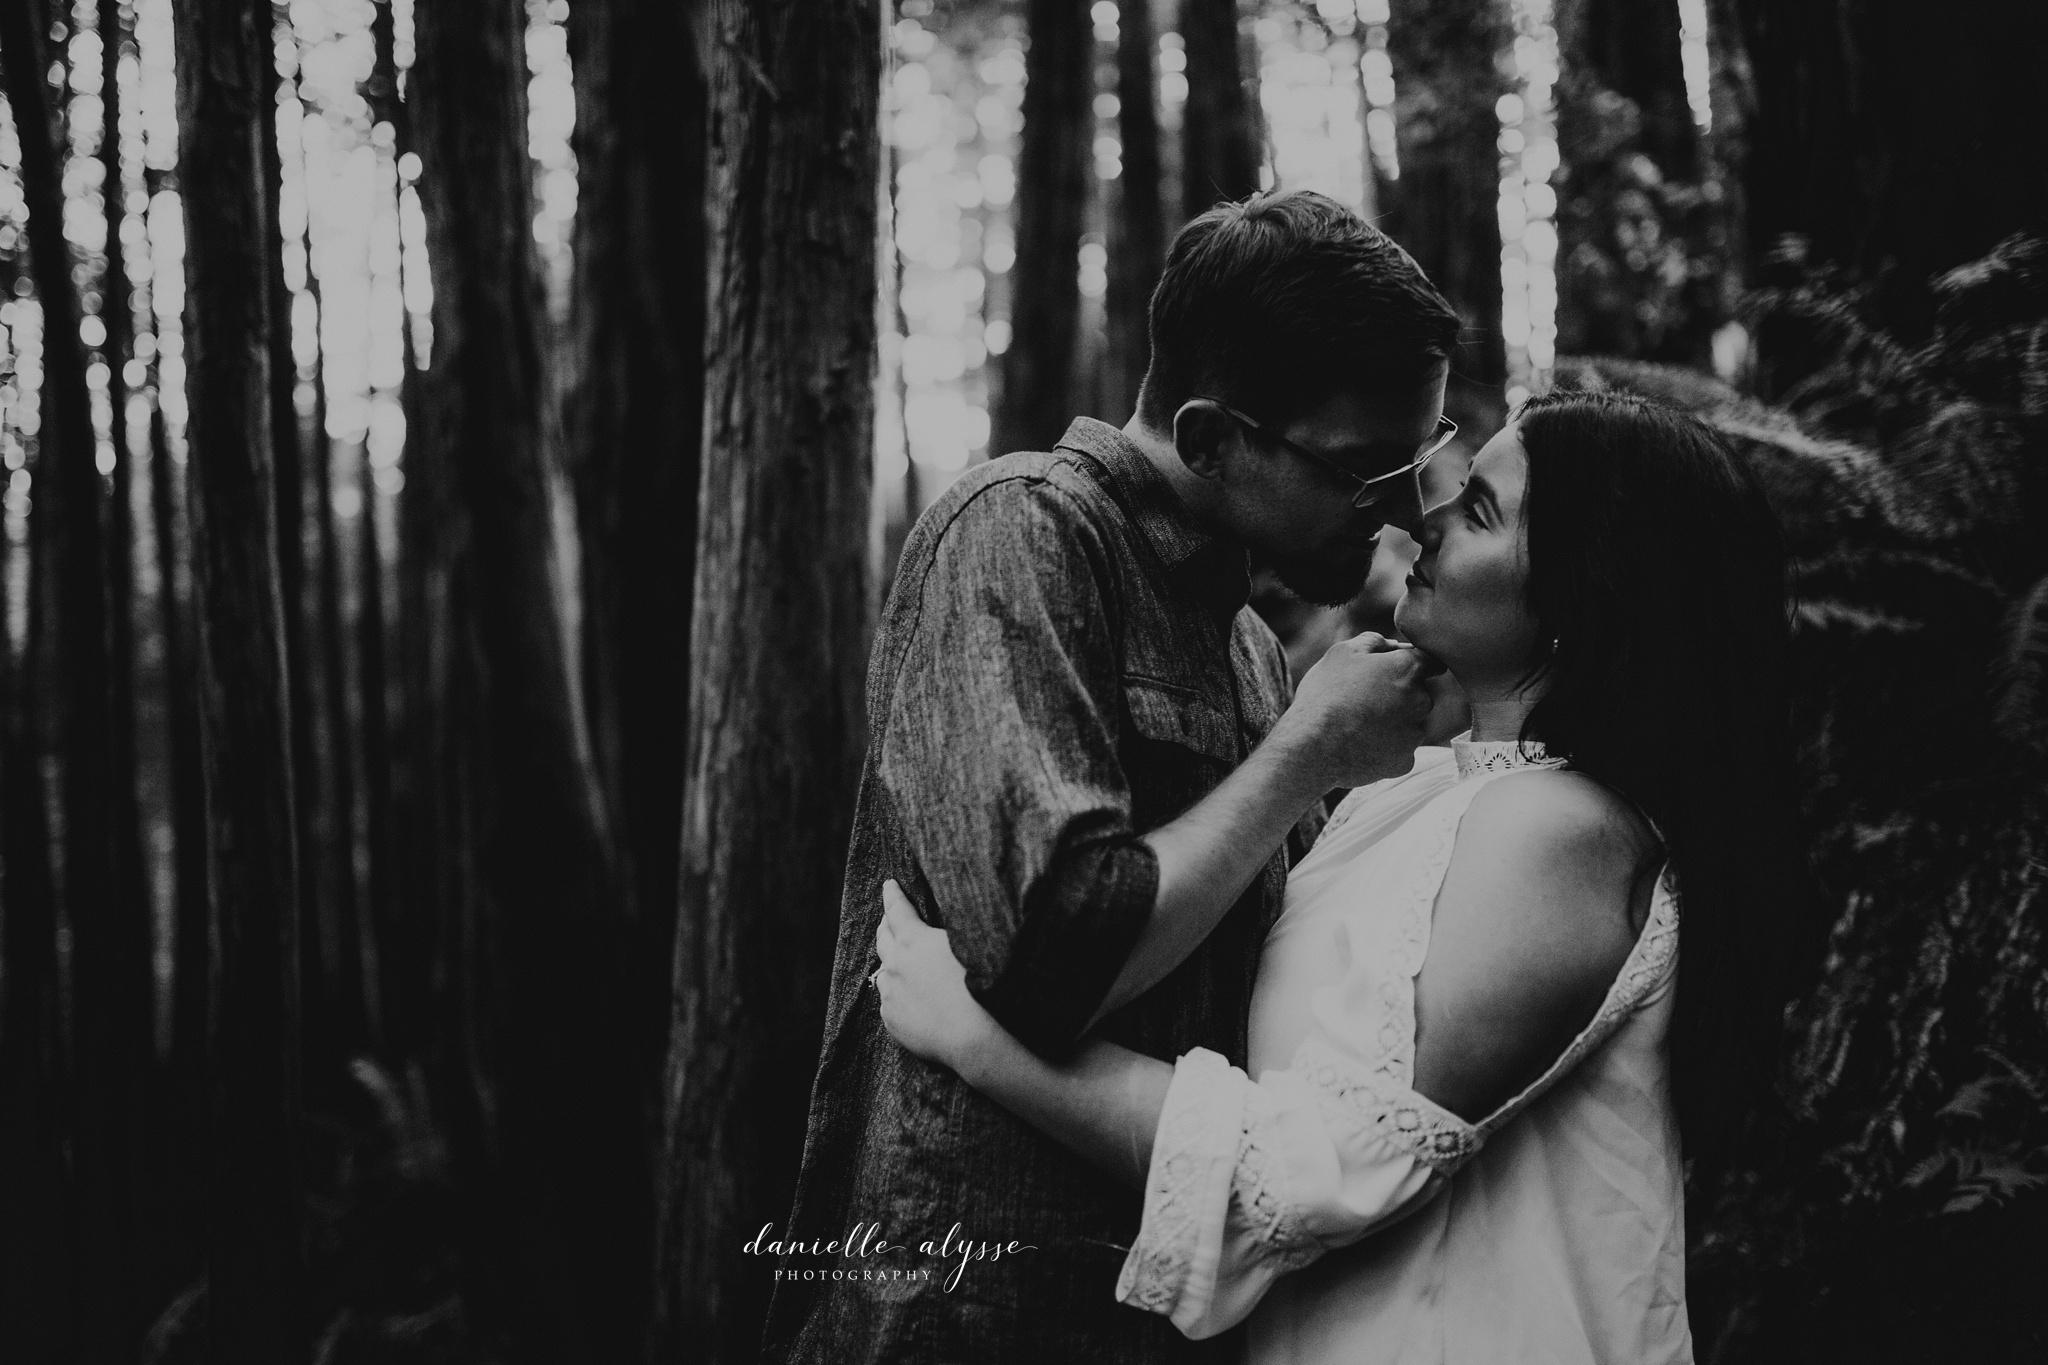 180503_engagement_bianca_muir_woods_mill_valley_danielle_alysse_photography_bay_area_photographer_blog_44_WEB.jpg